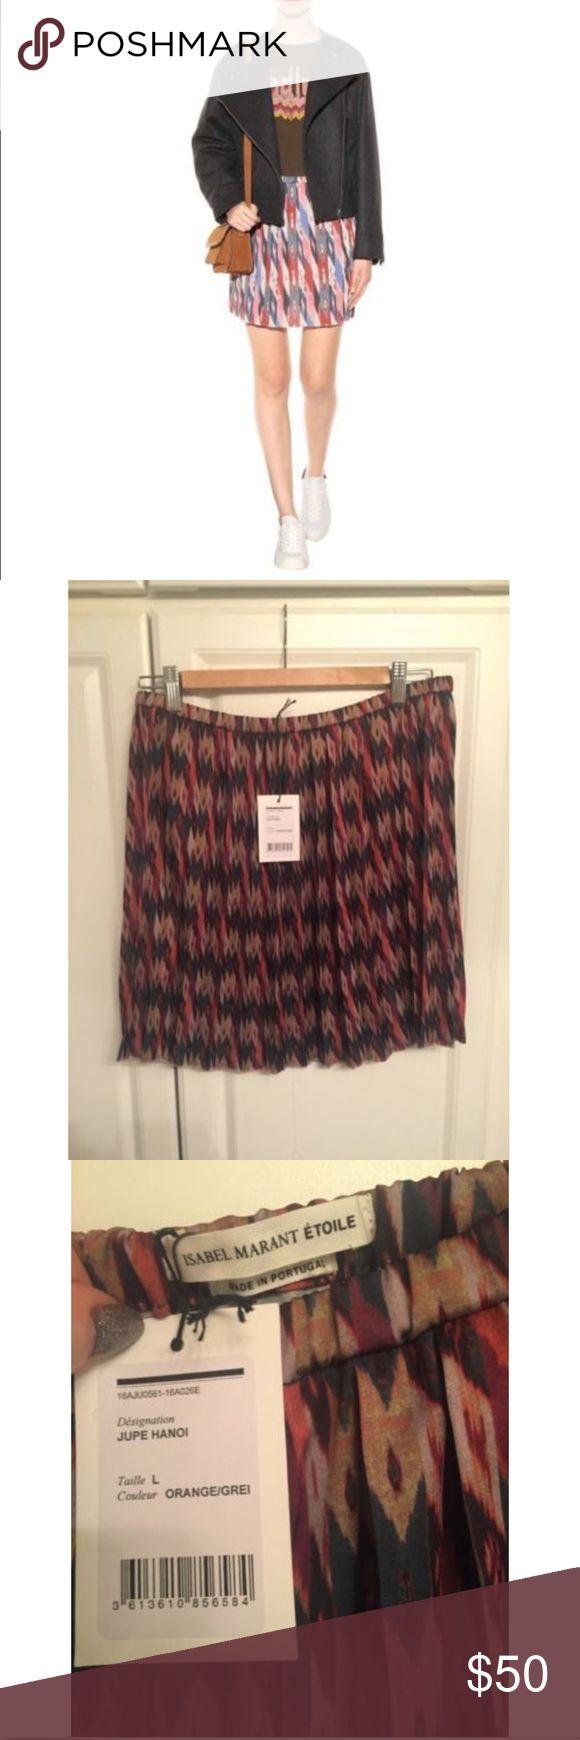 NYE sale!! Isabel Marant jupe hanoi skirt Beautiful skirt, NWT Isabel Marant Skirts Mini